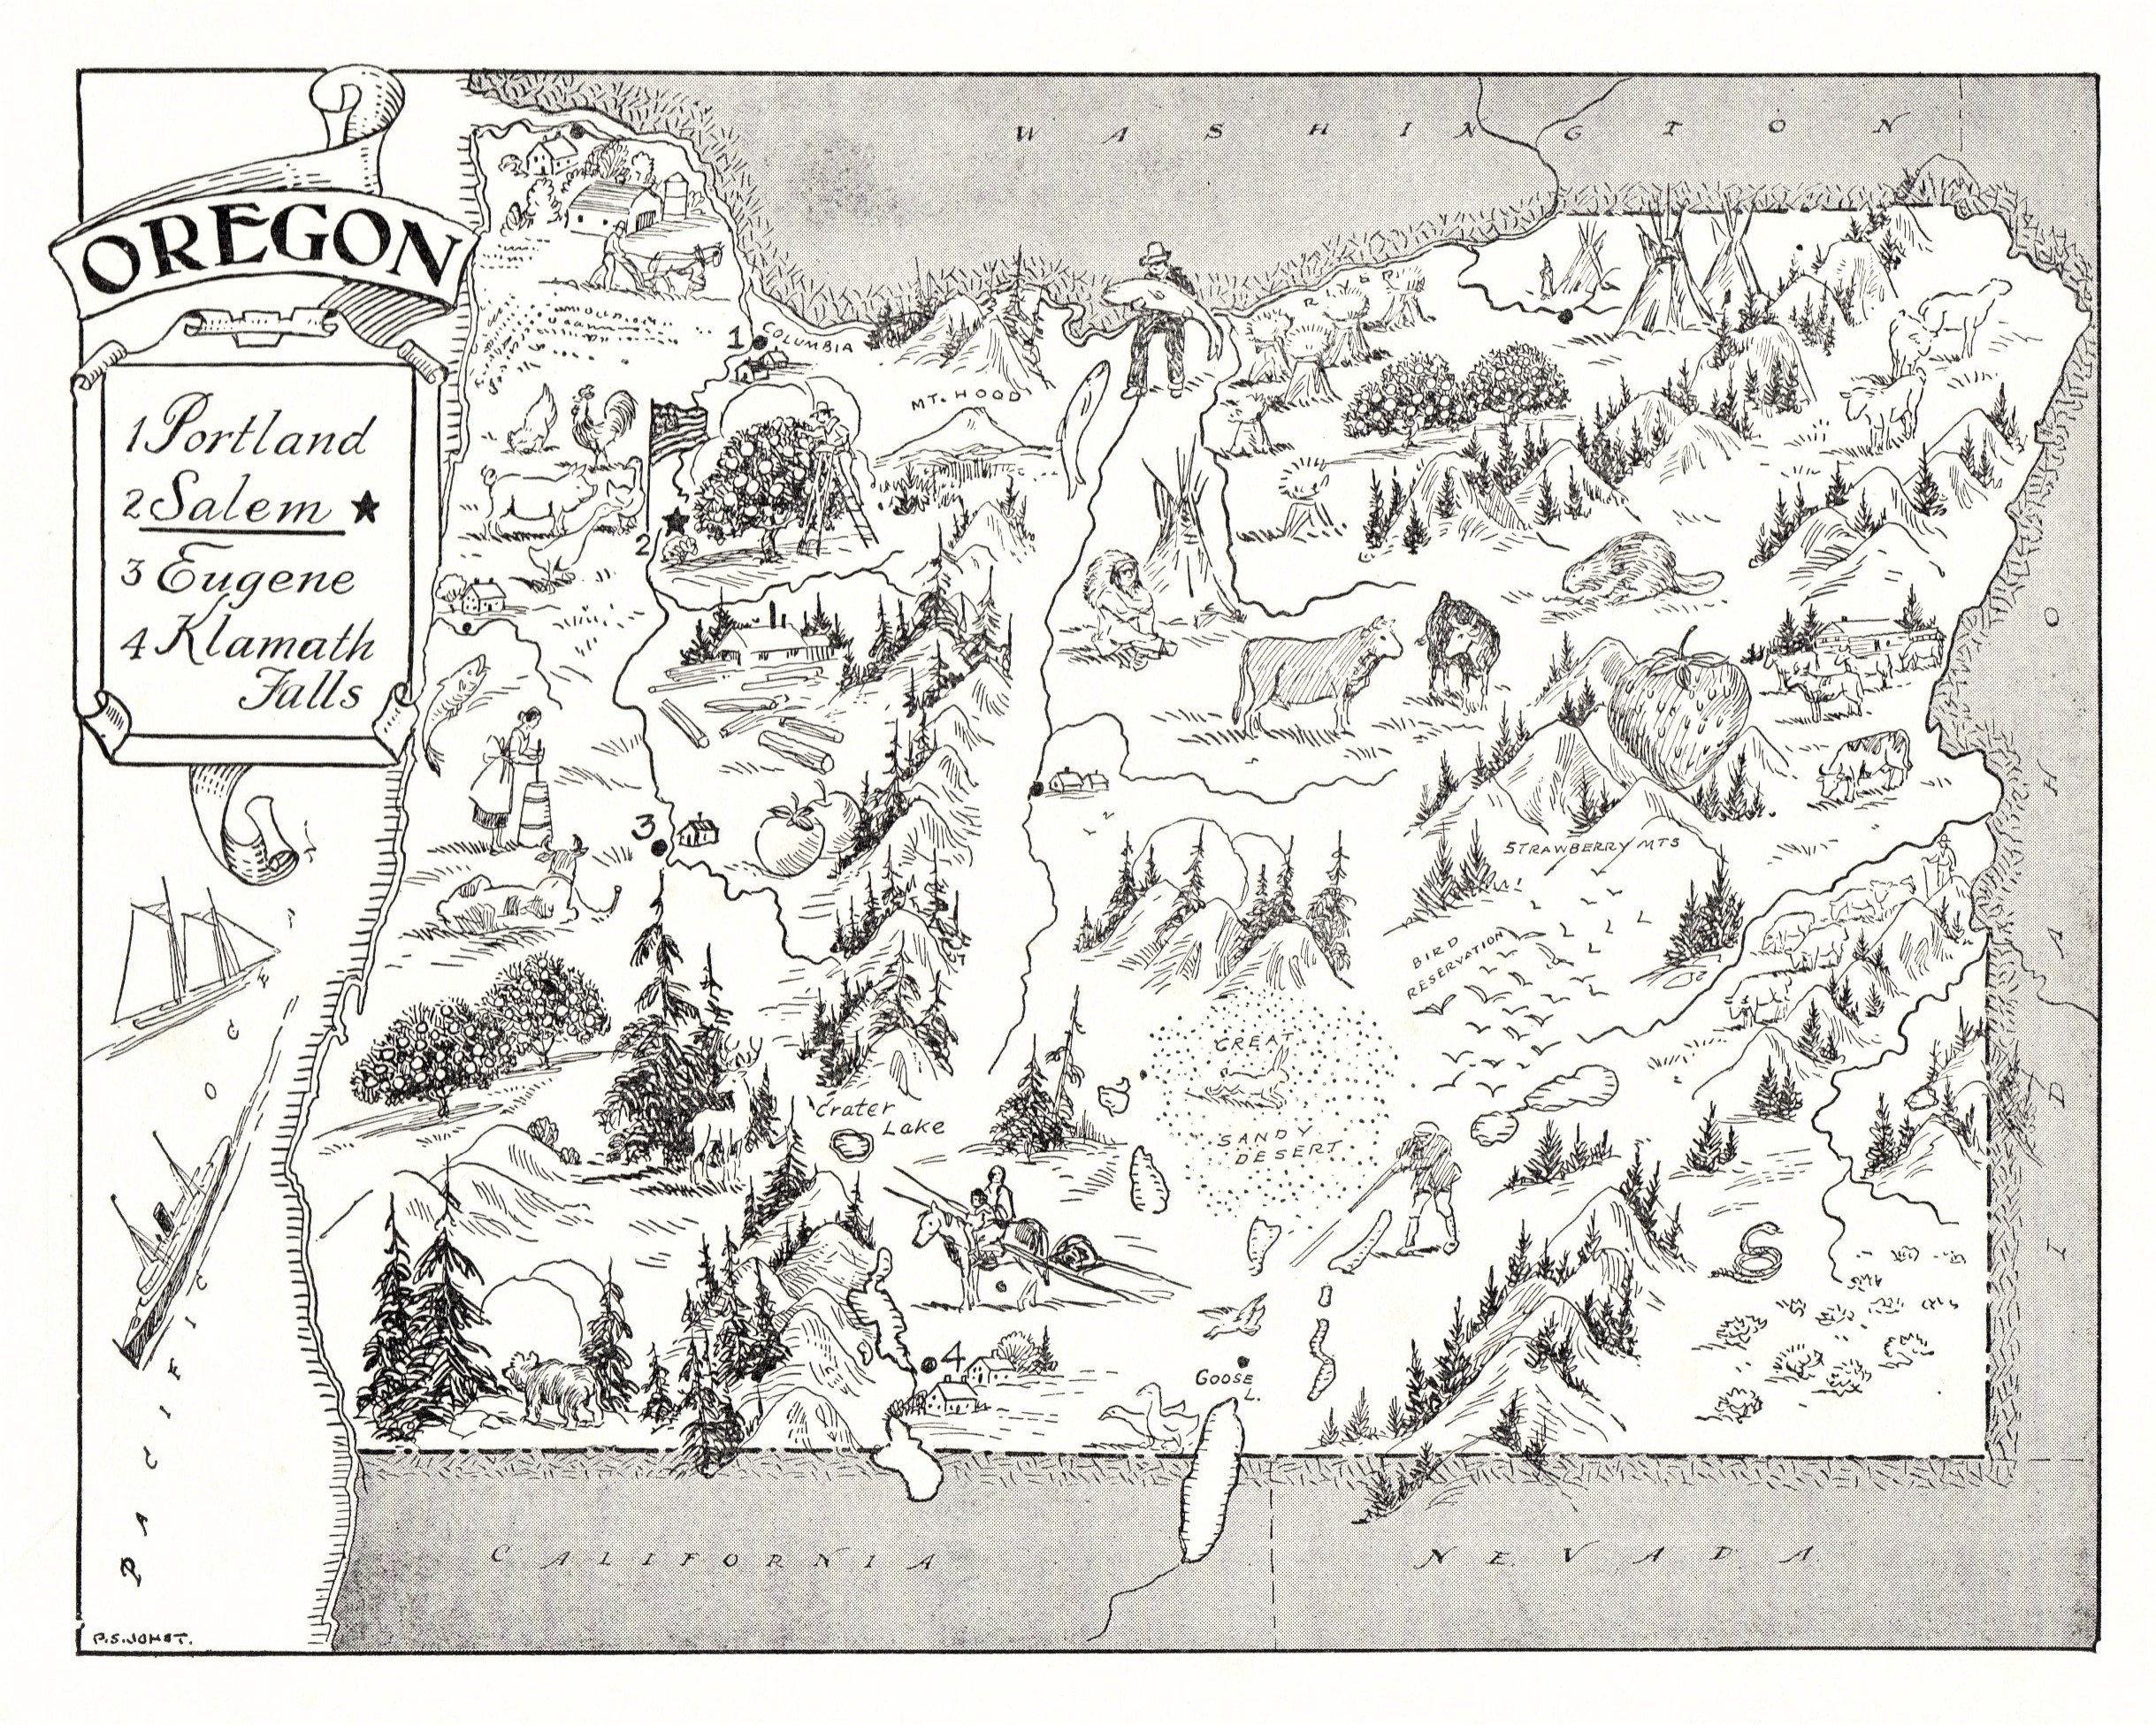 Old Map of Oregon State OREGON MAP PRINT Antique Map Print Vintage Map of Oregon Historical Wall Art